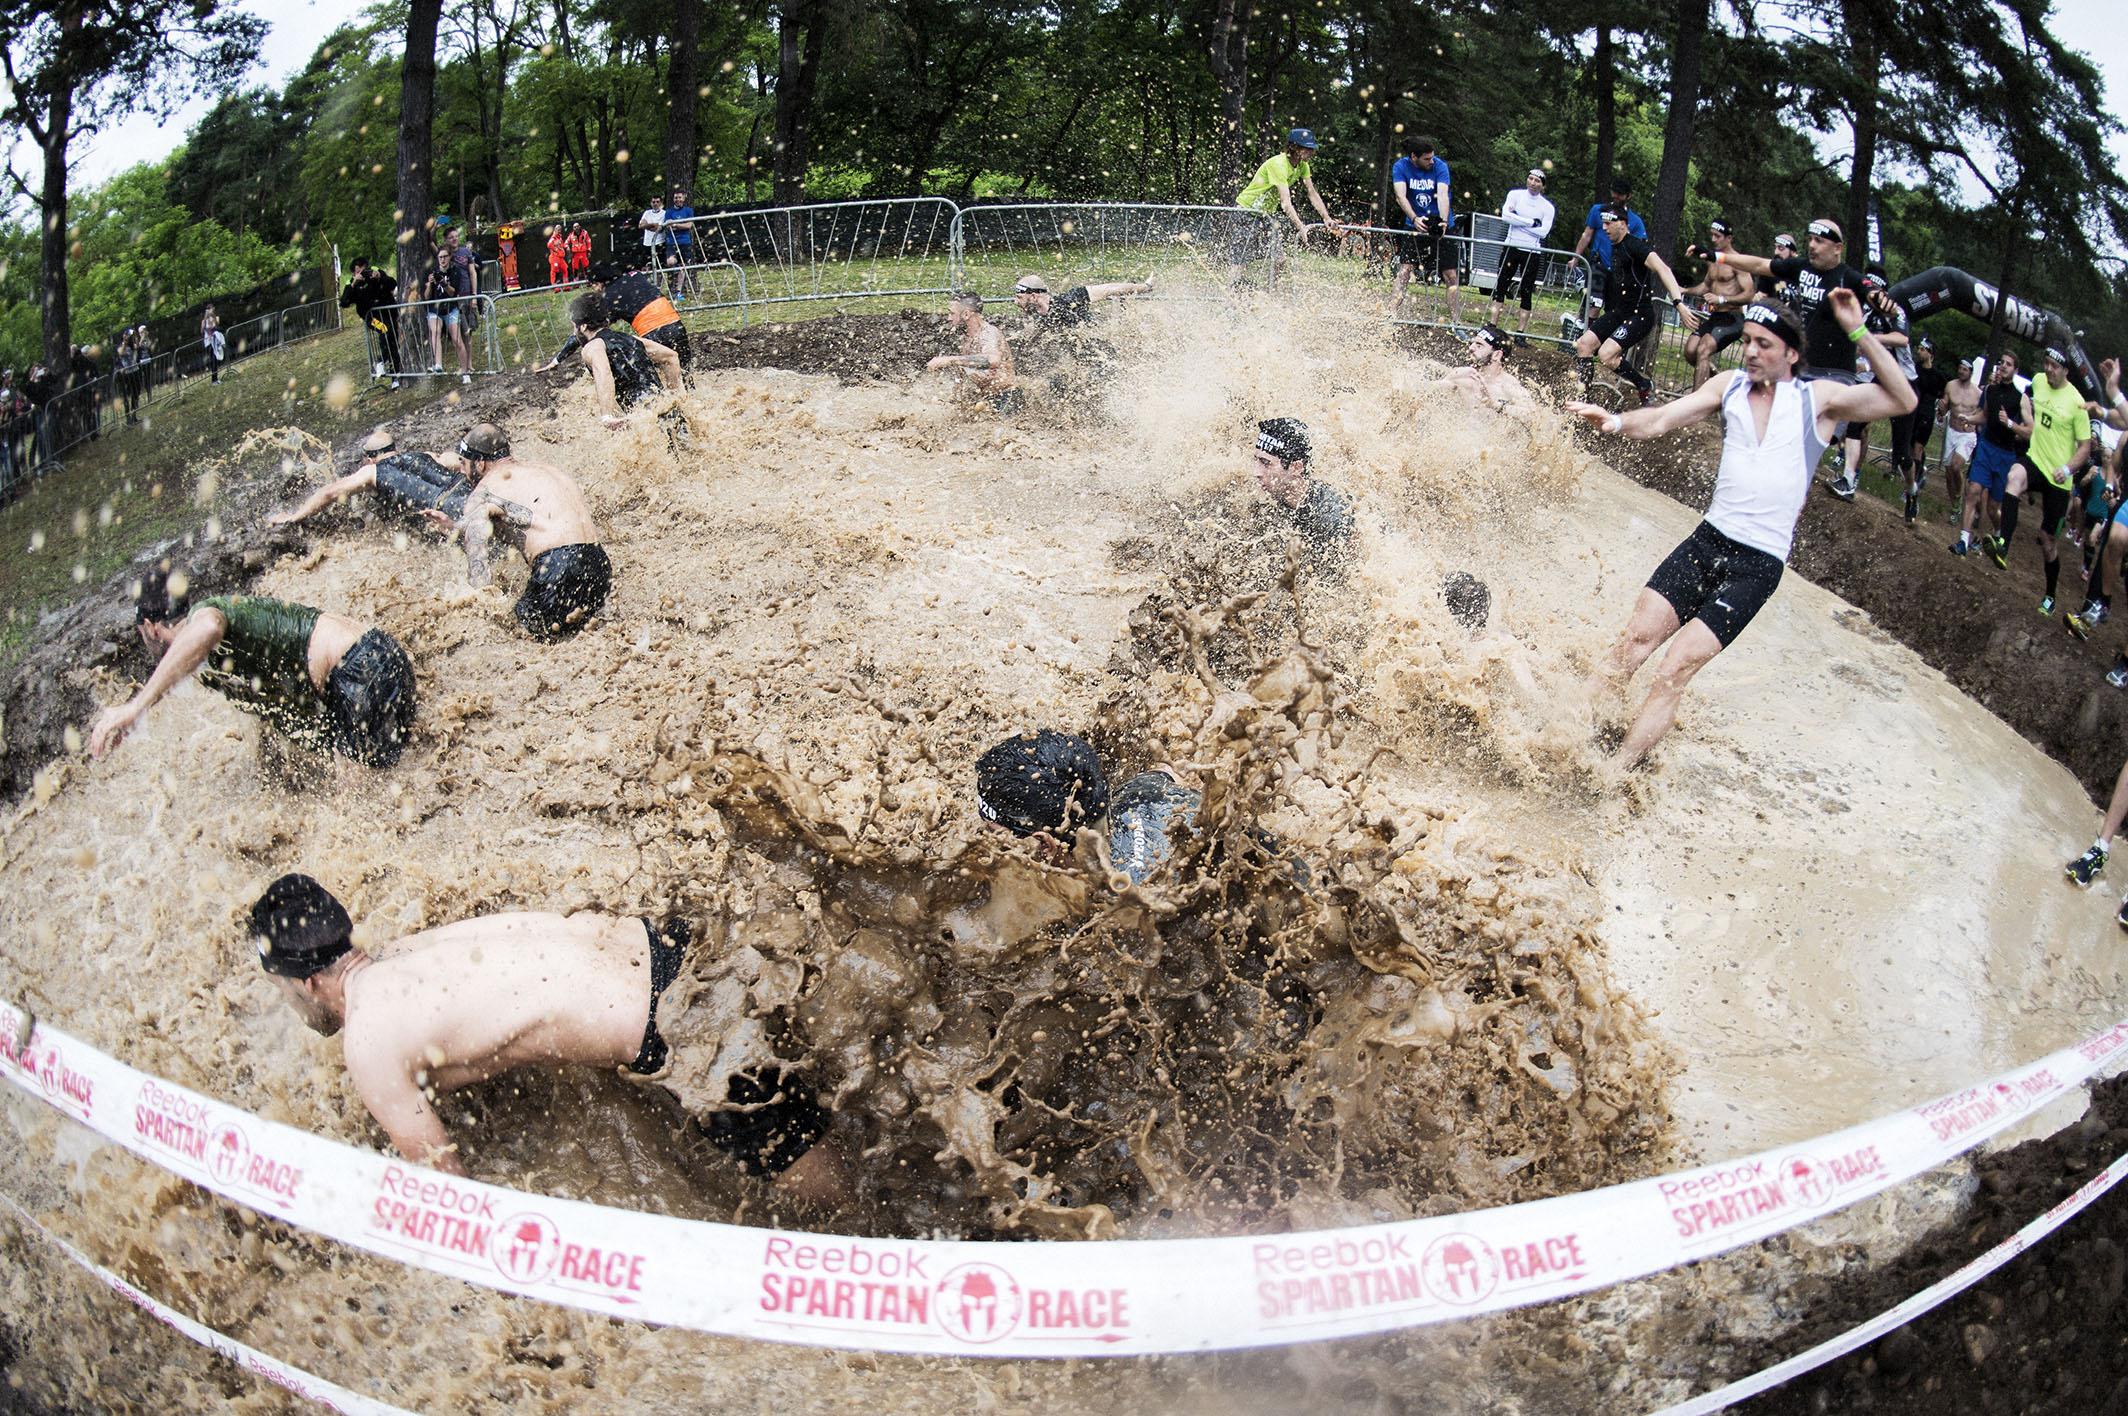 Reebok Spartan Race_Milano_Malpensa (5)